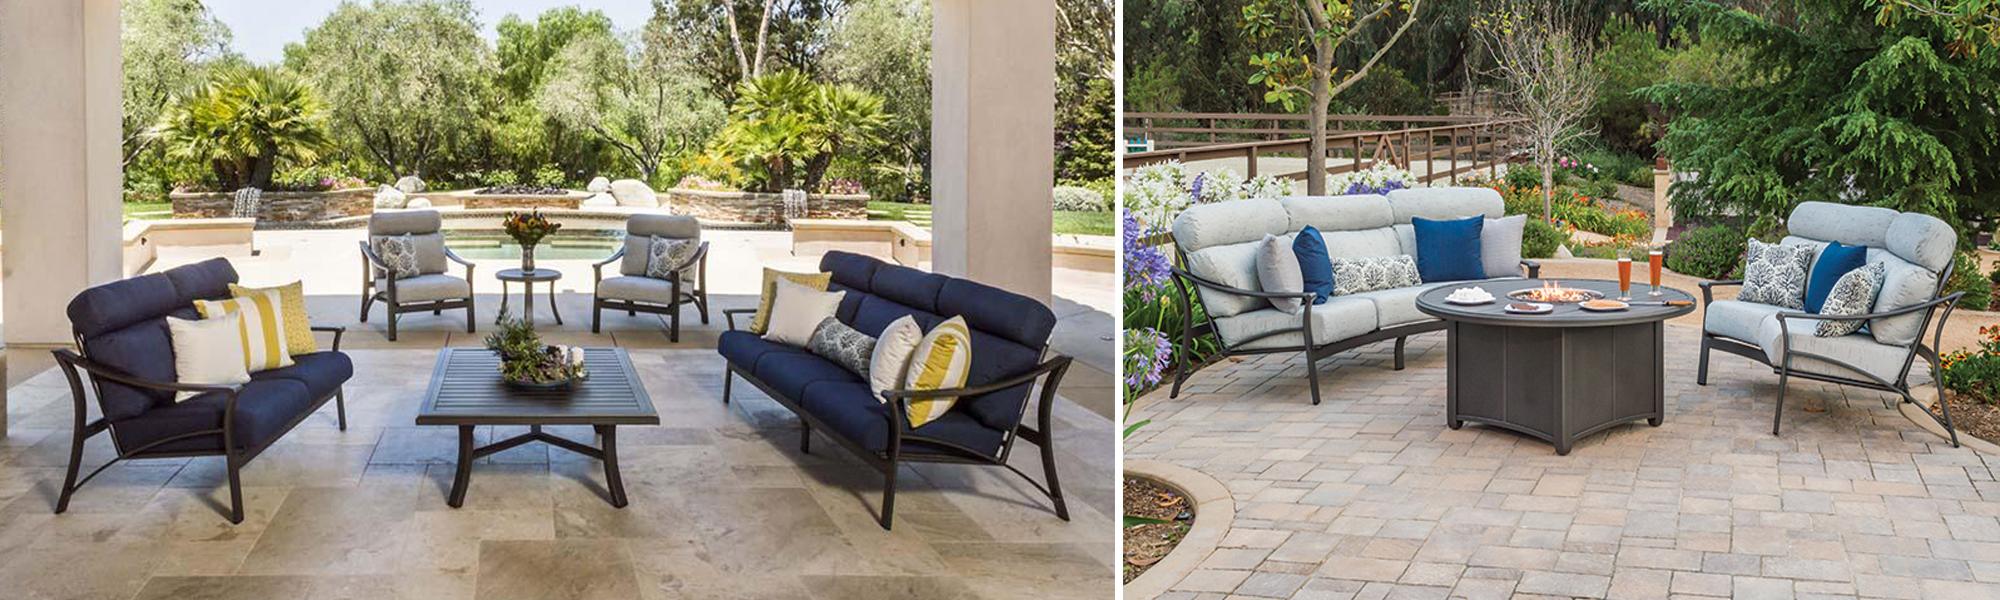 Patio Lounge Furniture